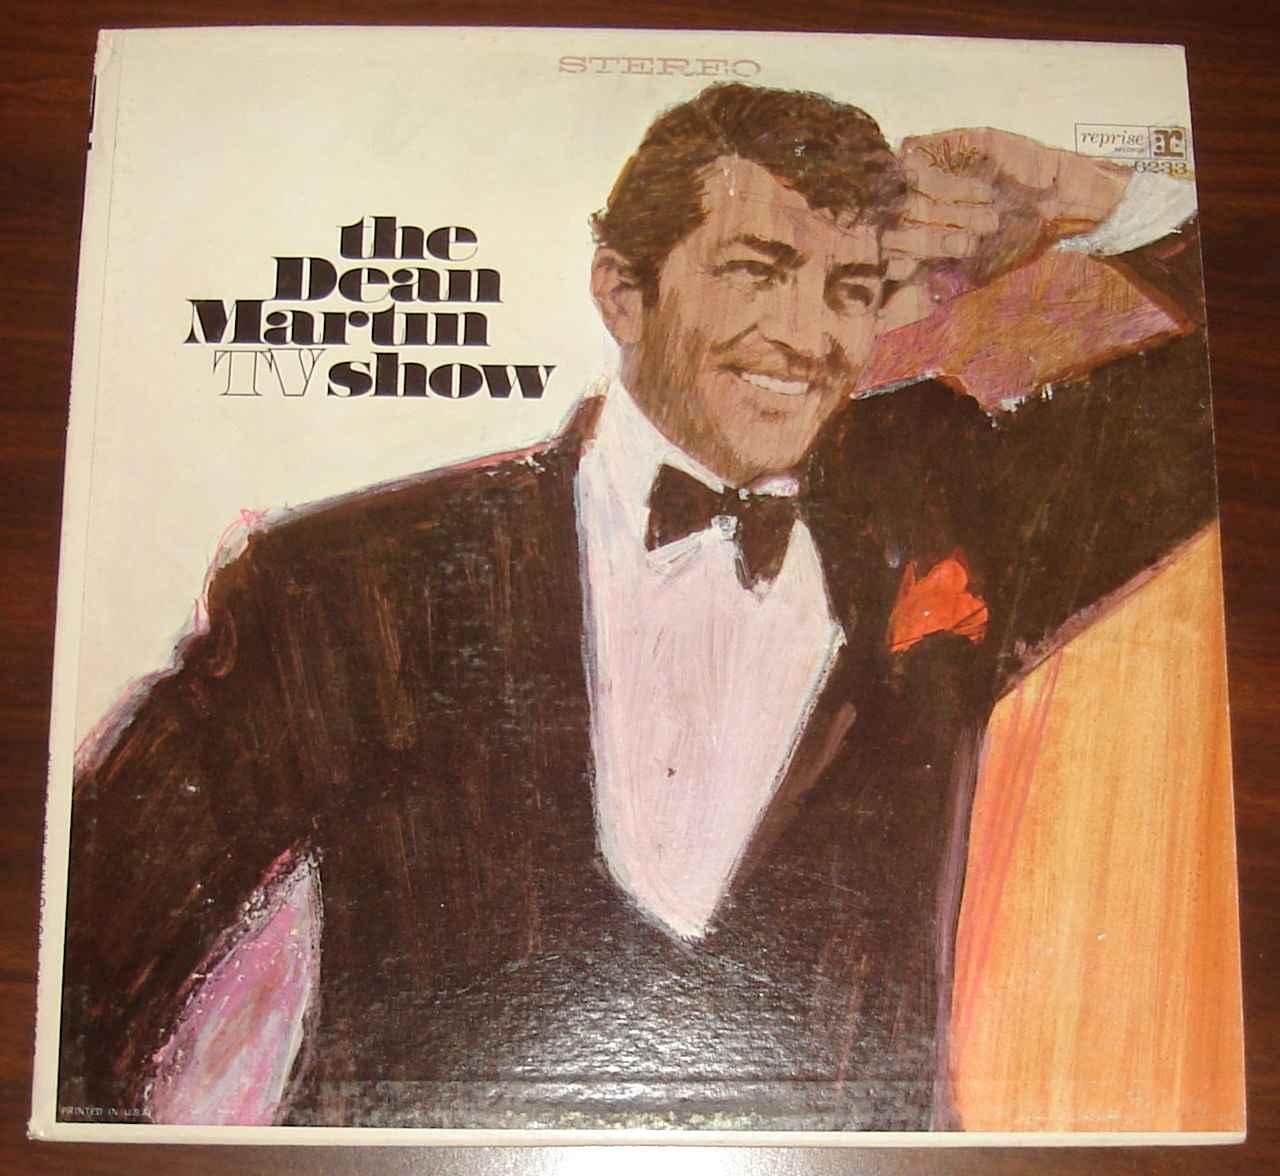 Dean Martin on vinyl--oh, yeah